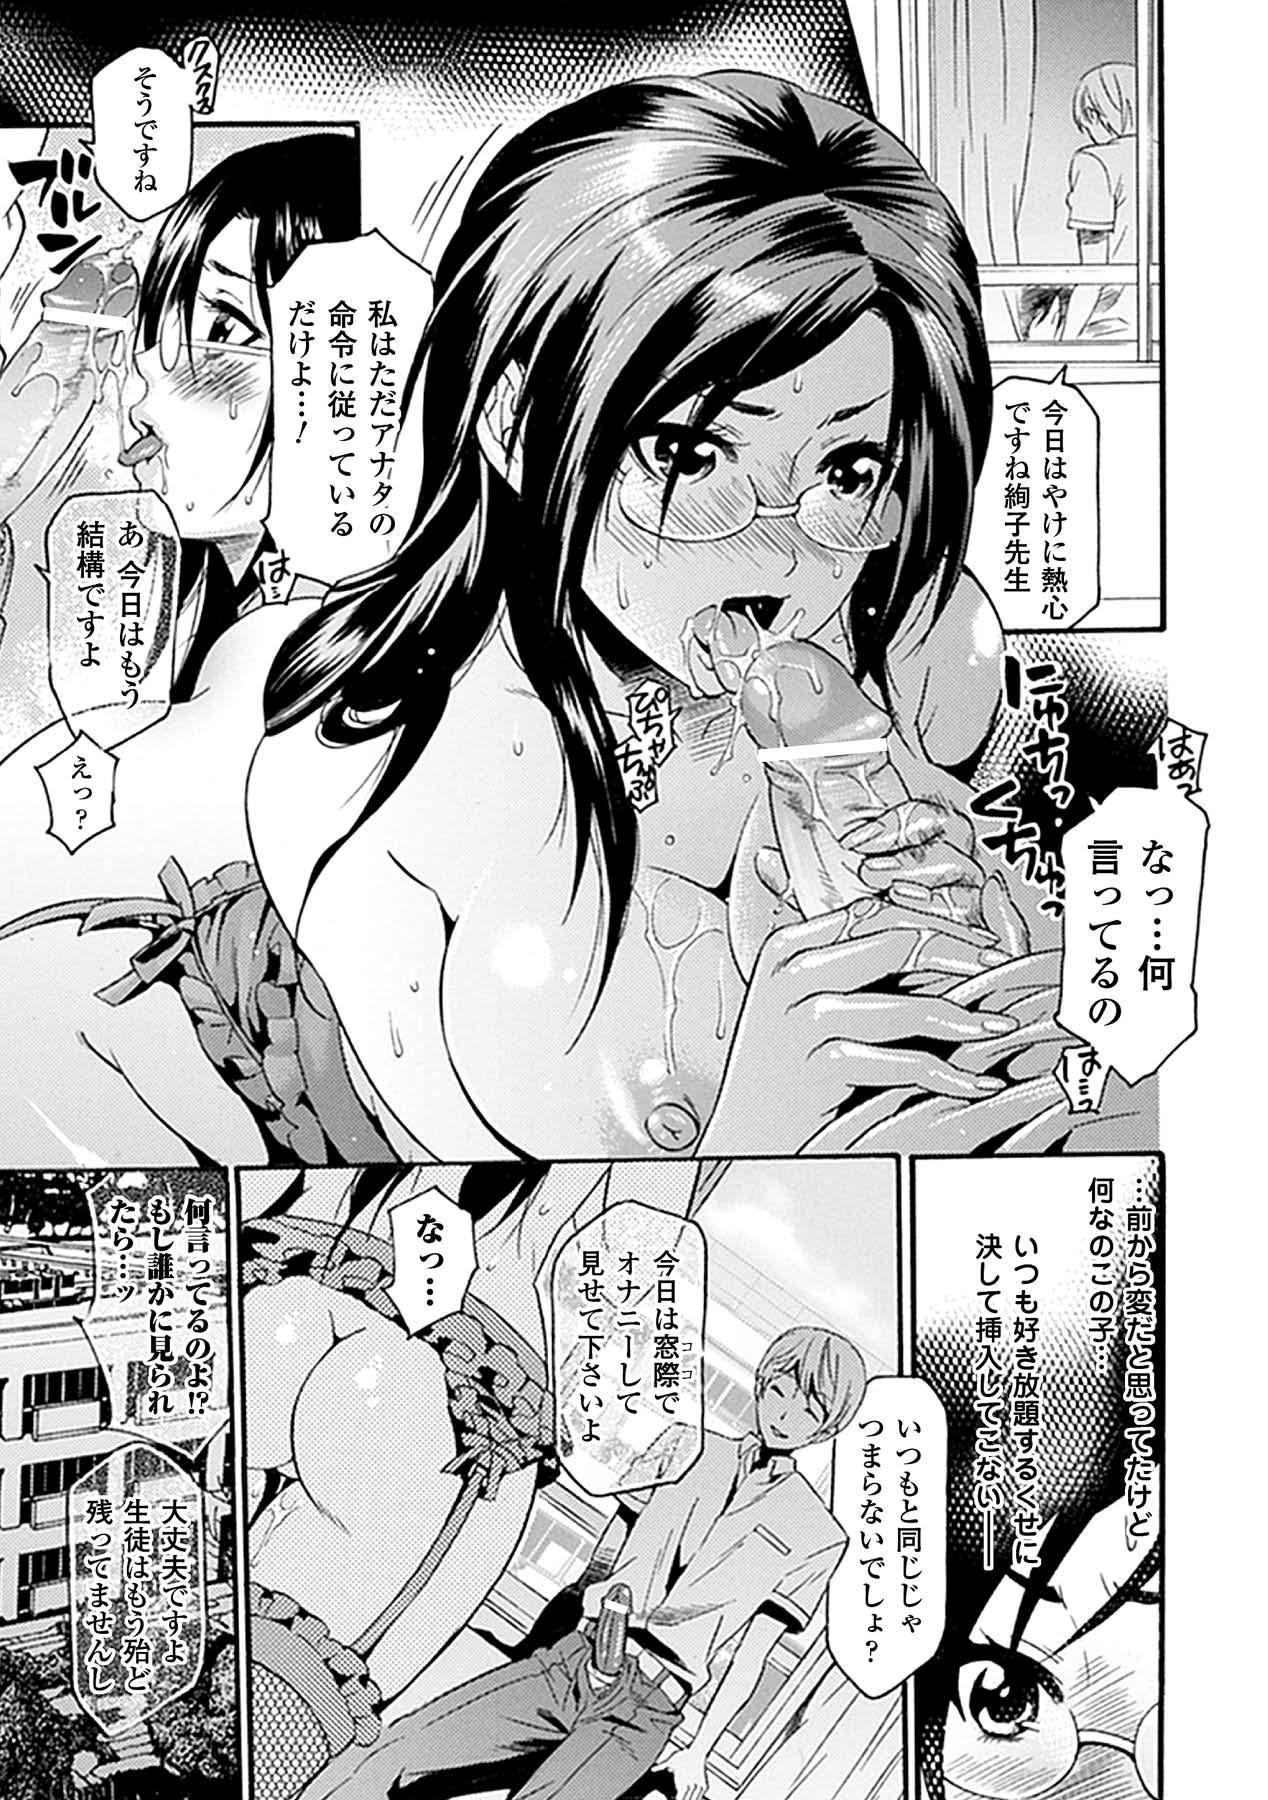 Kyousei Roshutsu Vol.1 Digital 34